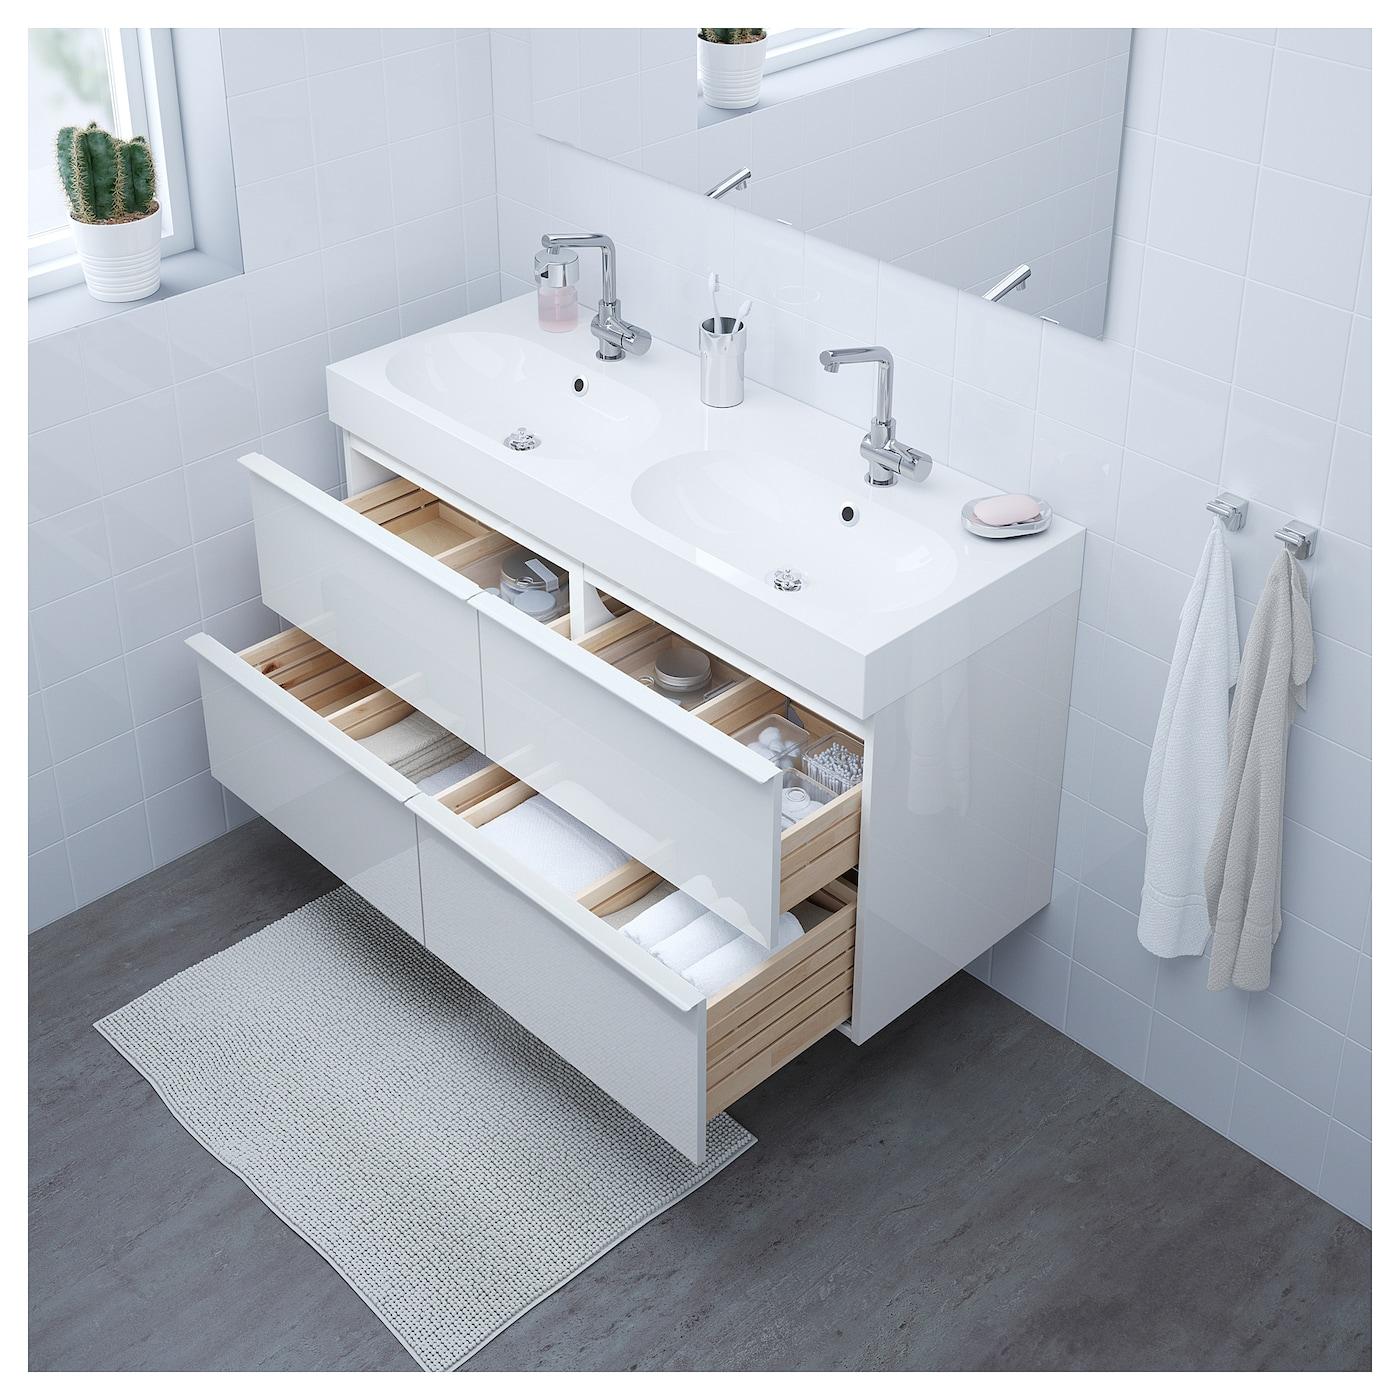 br viken godmorgon armario lavabo 4cajones alto brillo blanco 120 x 48 x 68 cm ikea. Black Bedroom Furniture Sets. Home Design Ideas